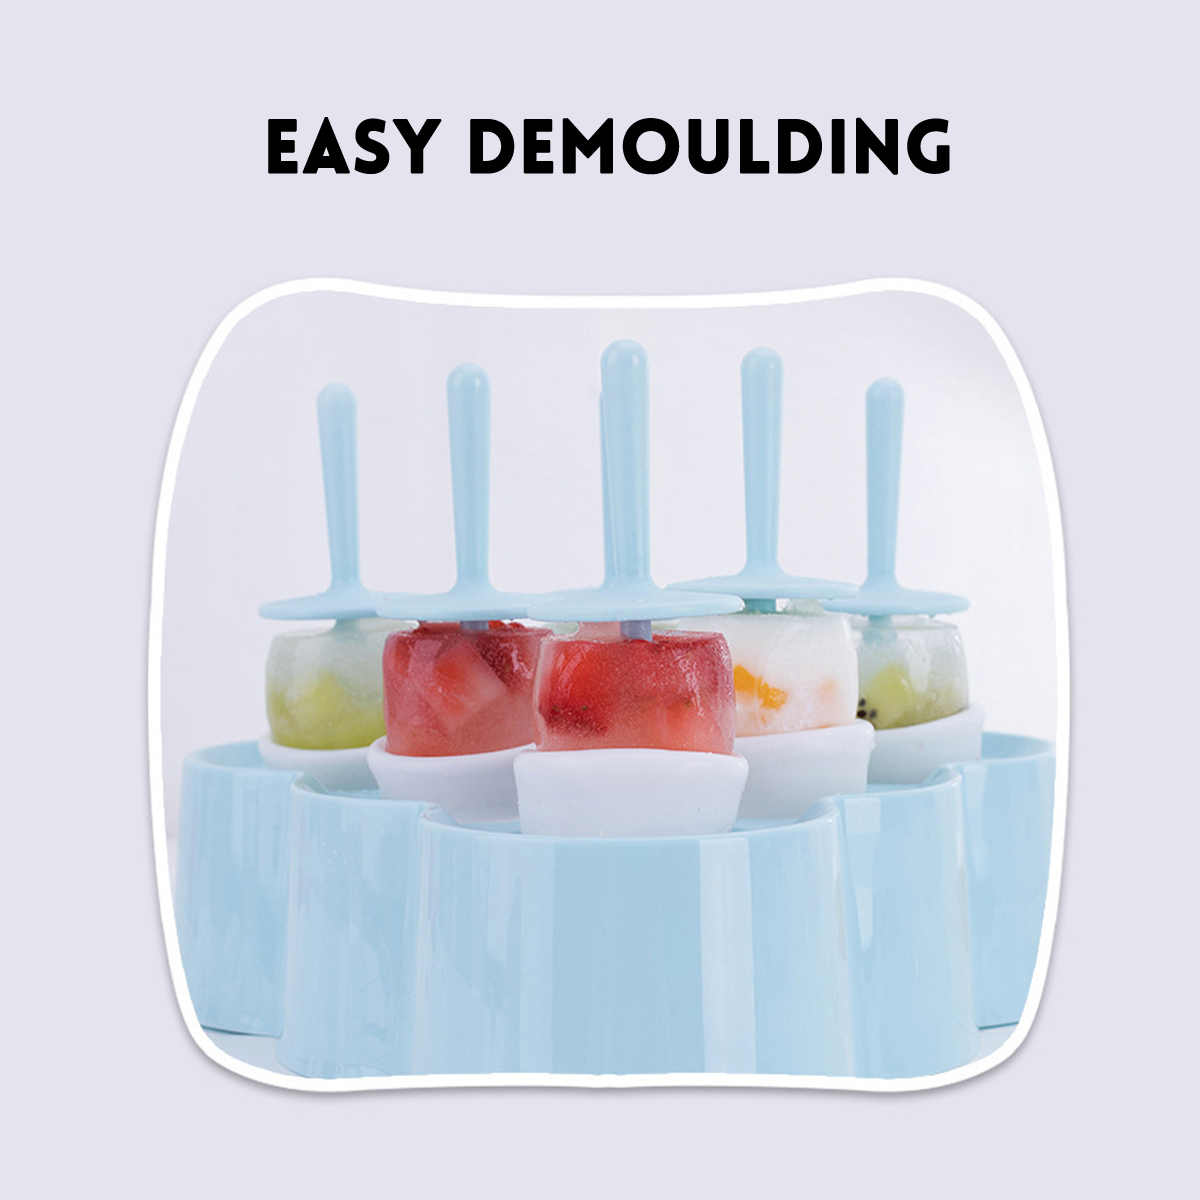 6 Lỗ Silicone Popsicle Khuôn Làm Kem Khuôn Làm Kem Popsicle IcePop Máy Làm Khuôn Mẫu Với Popsicle Dính